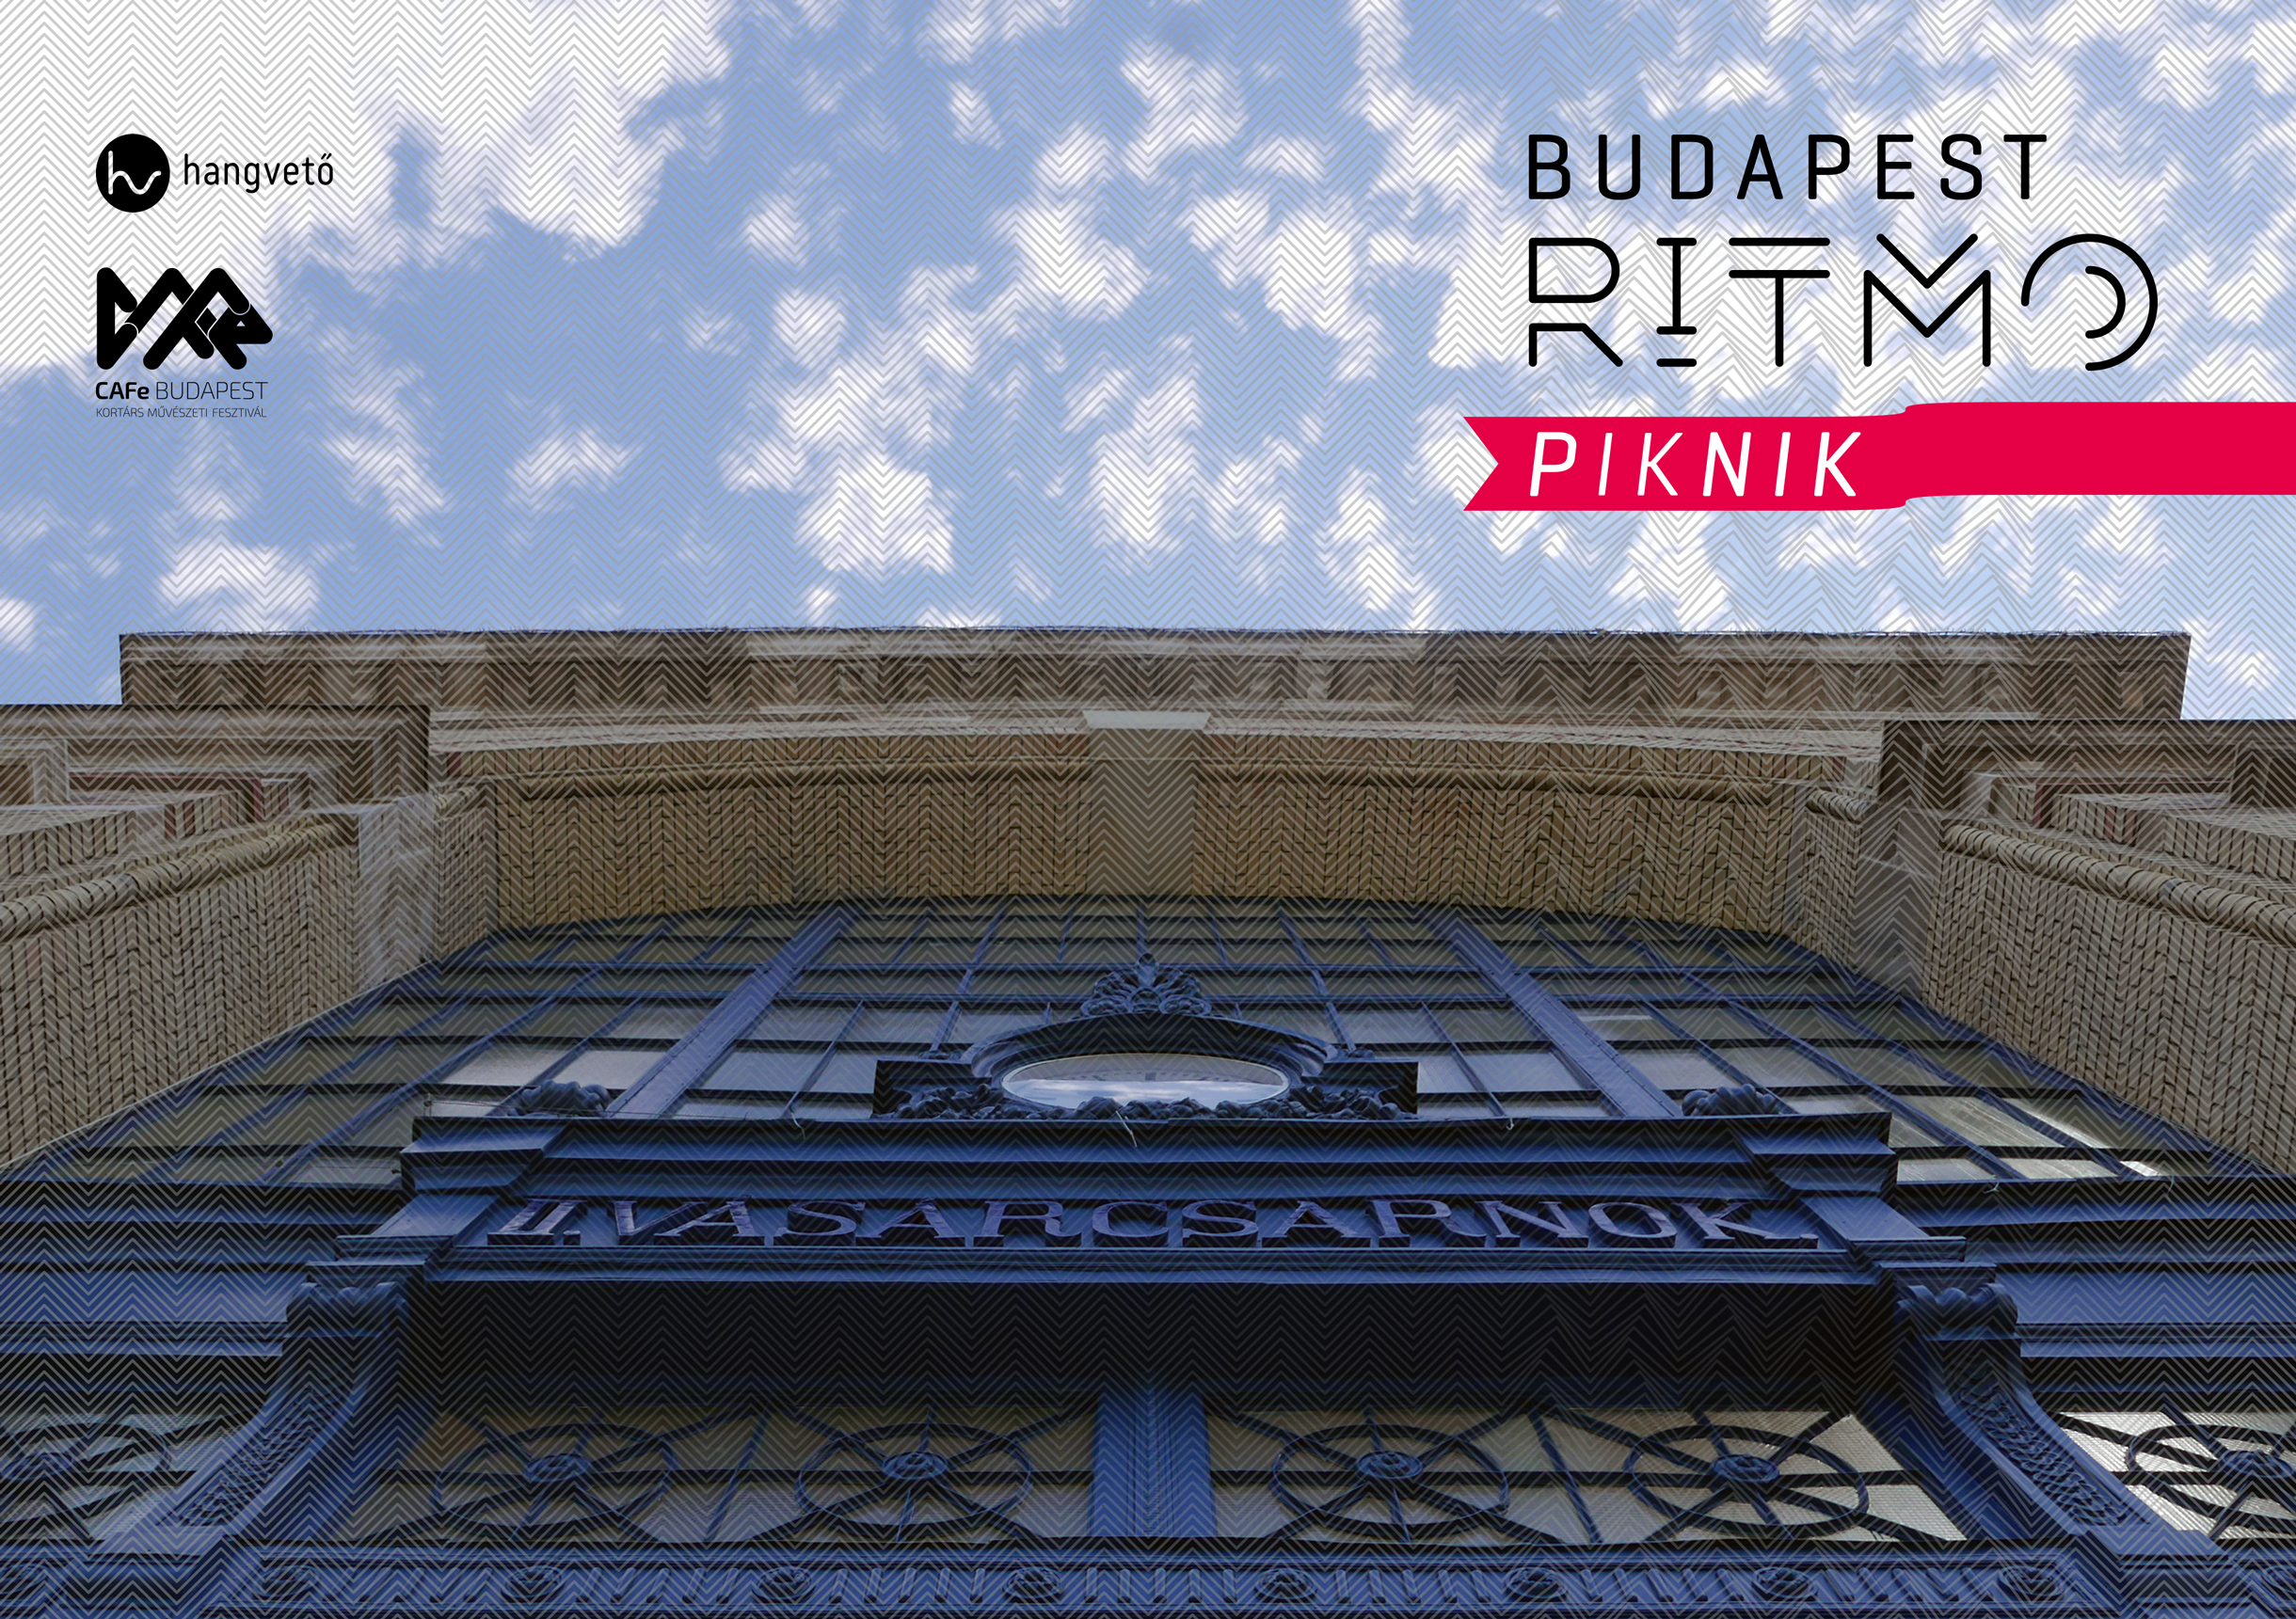 bpritmo20_piknik_p1040713.jpg